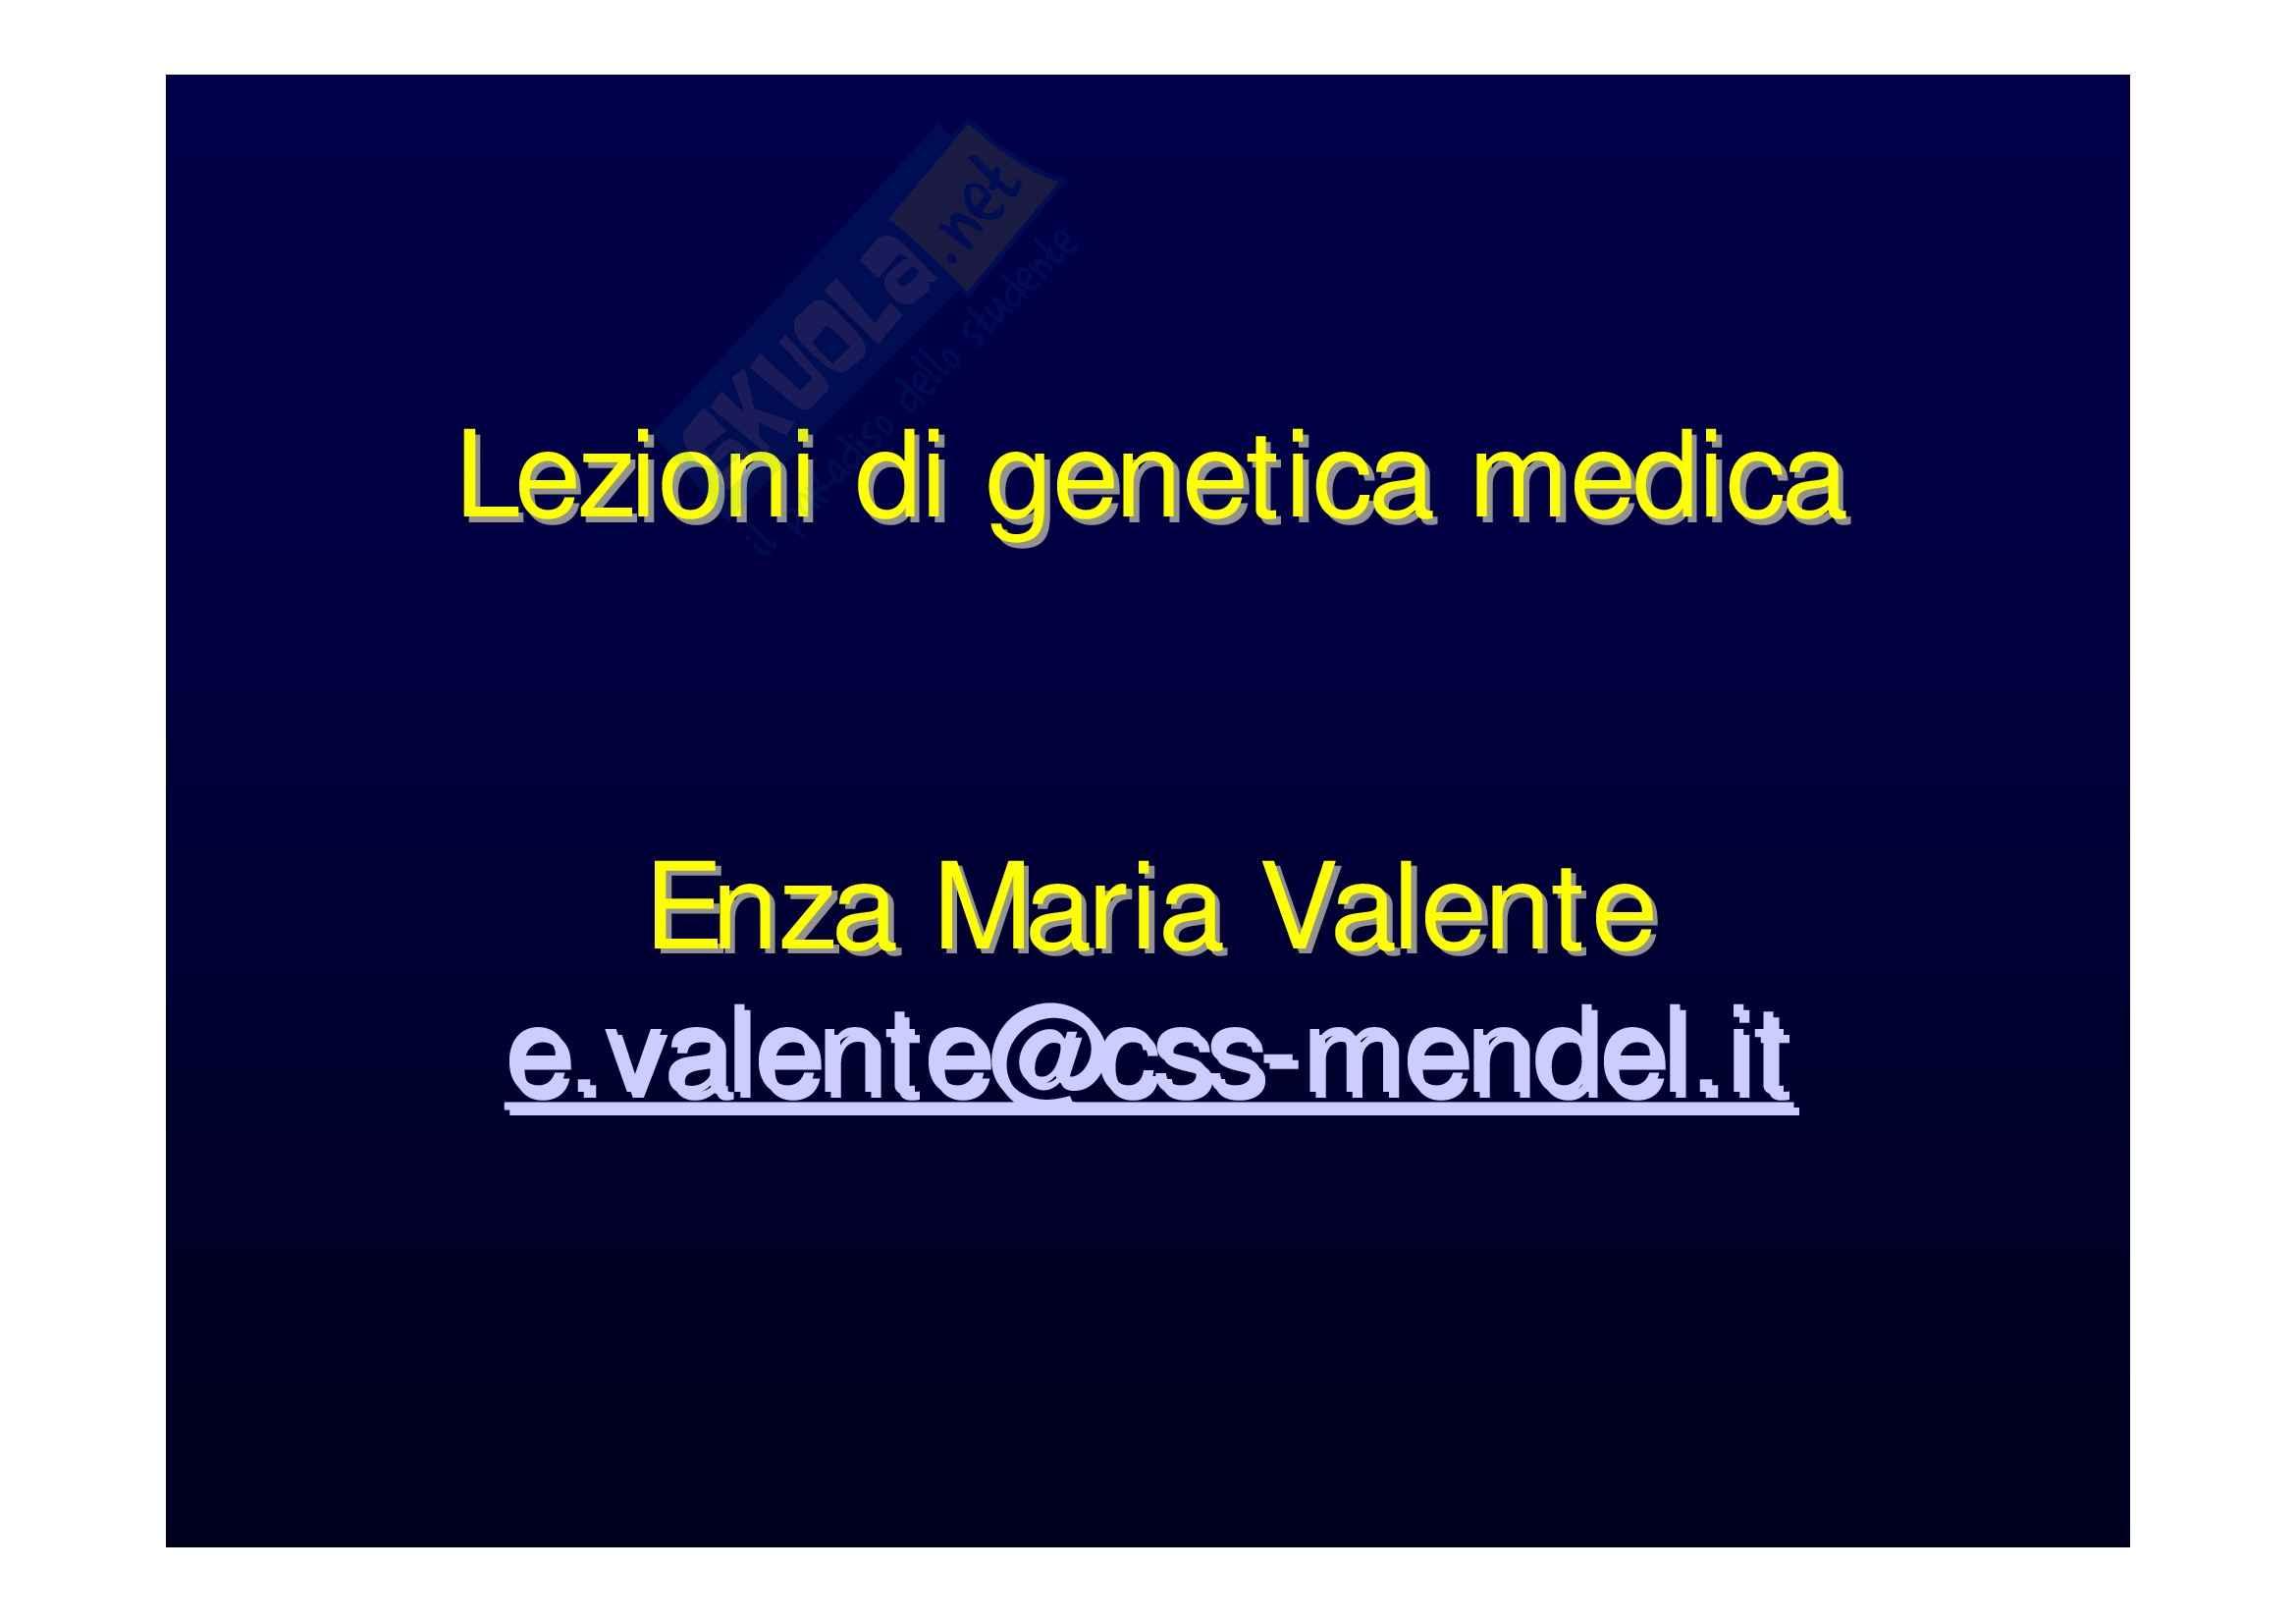 appunto E. Valente Genetica medica